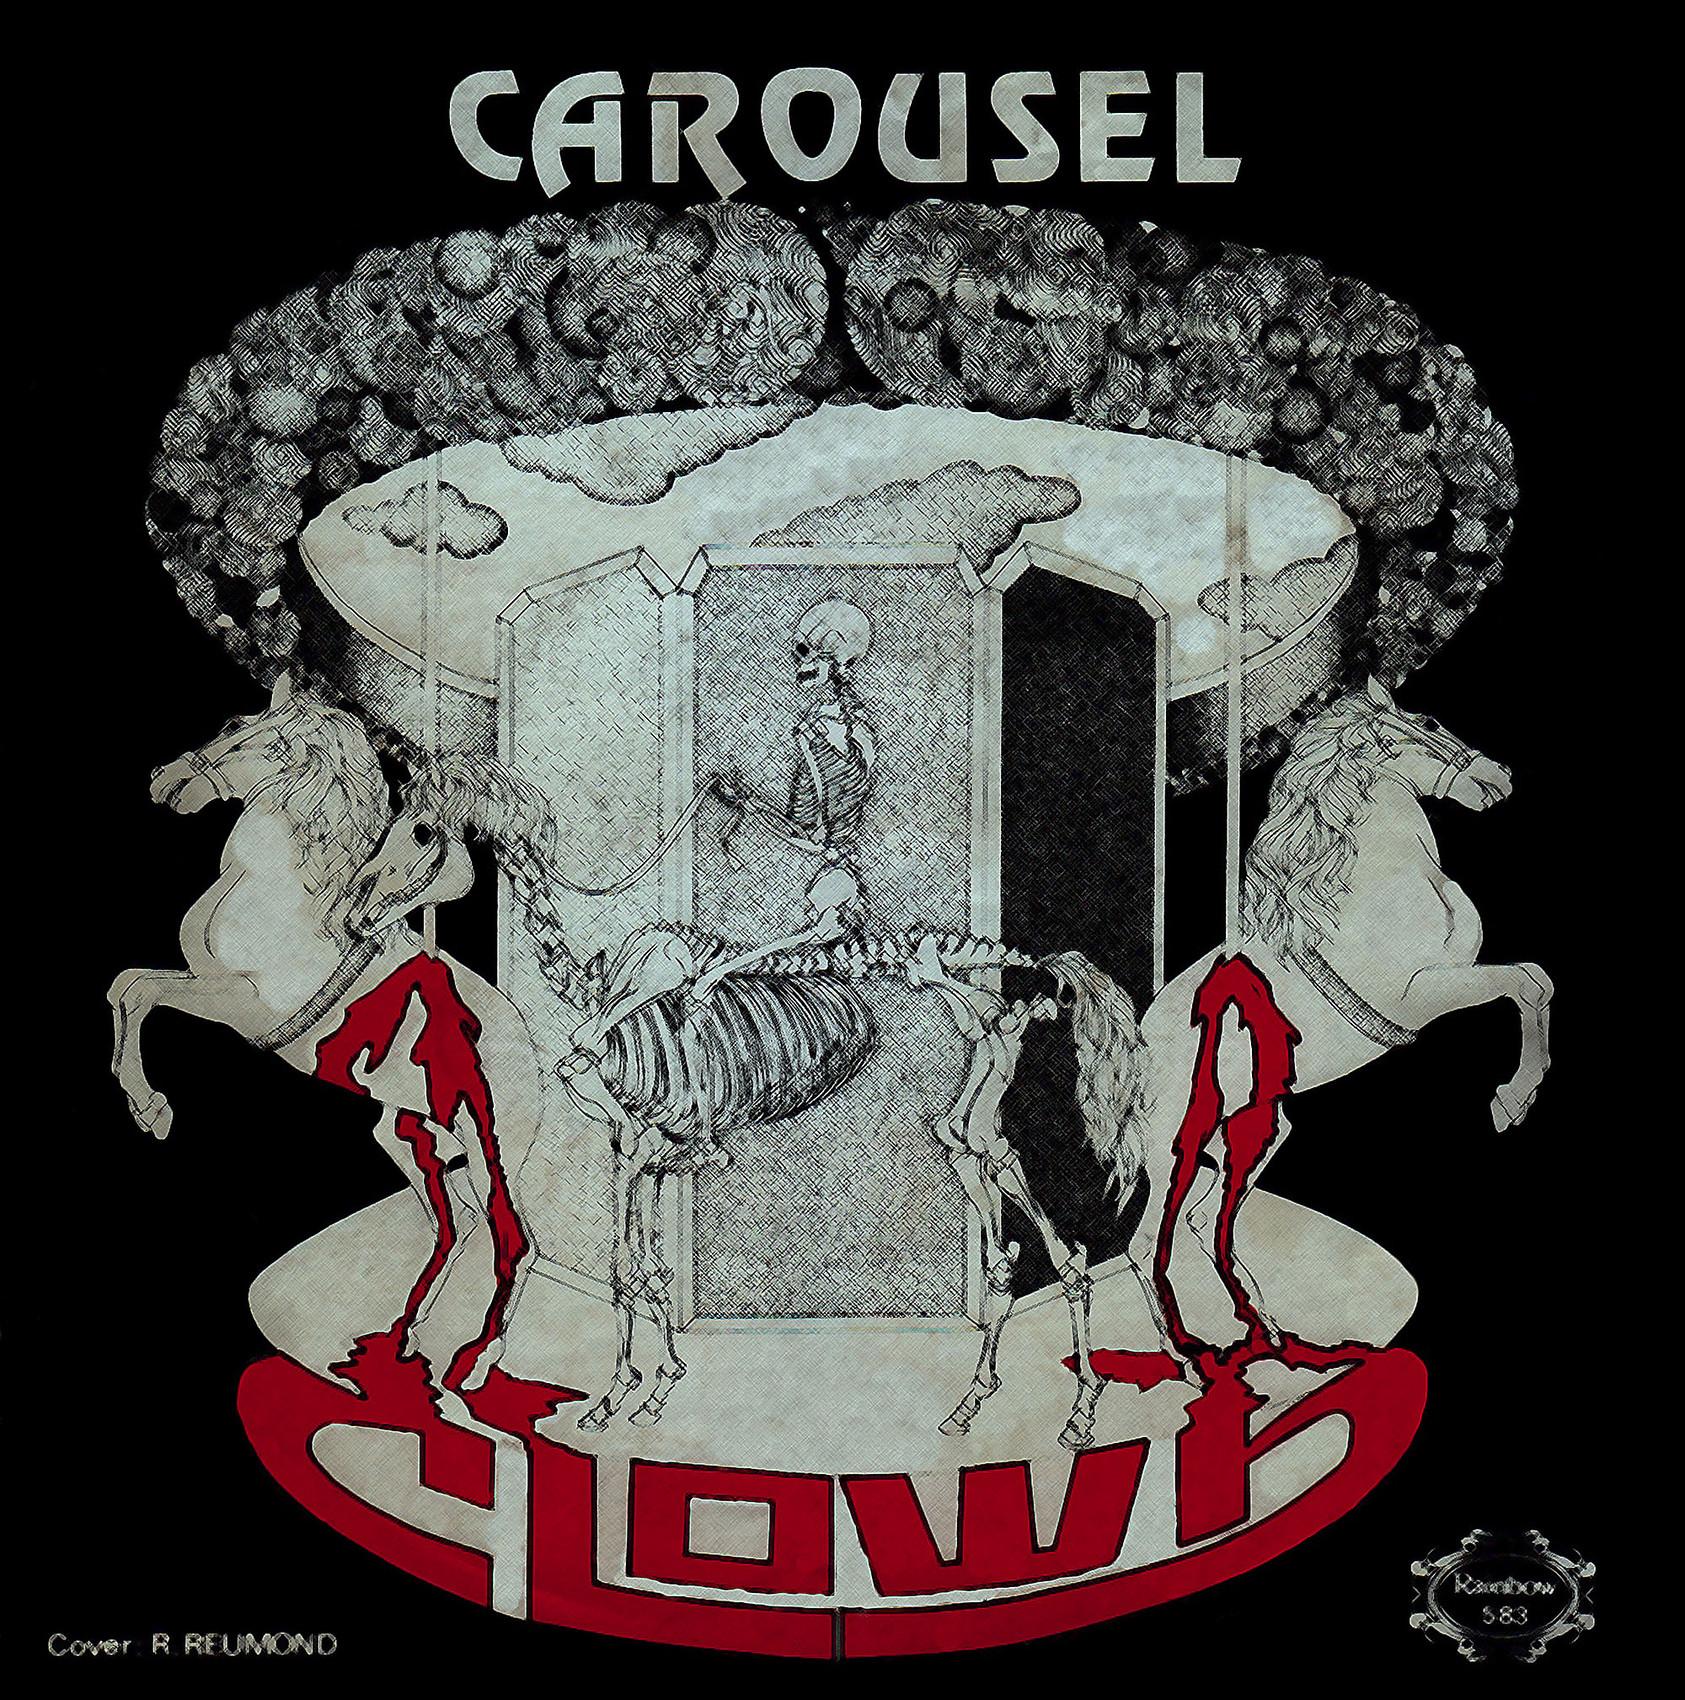 Carousel (1984)